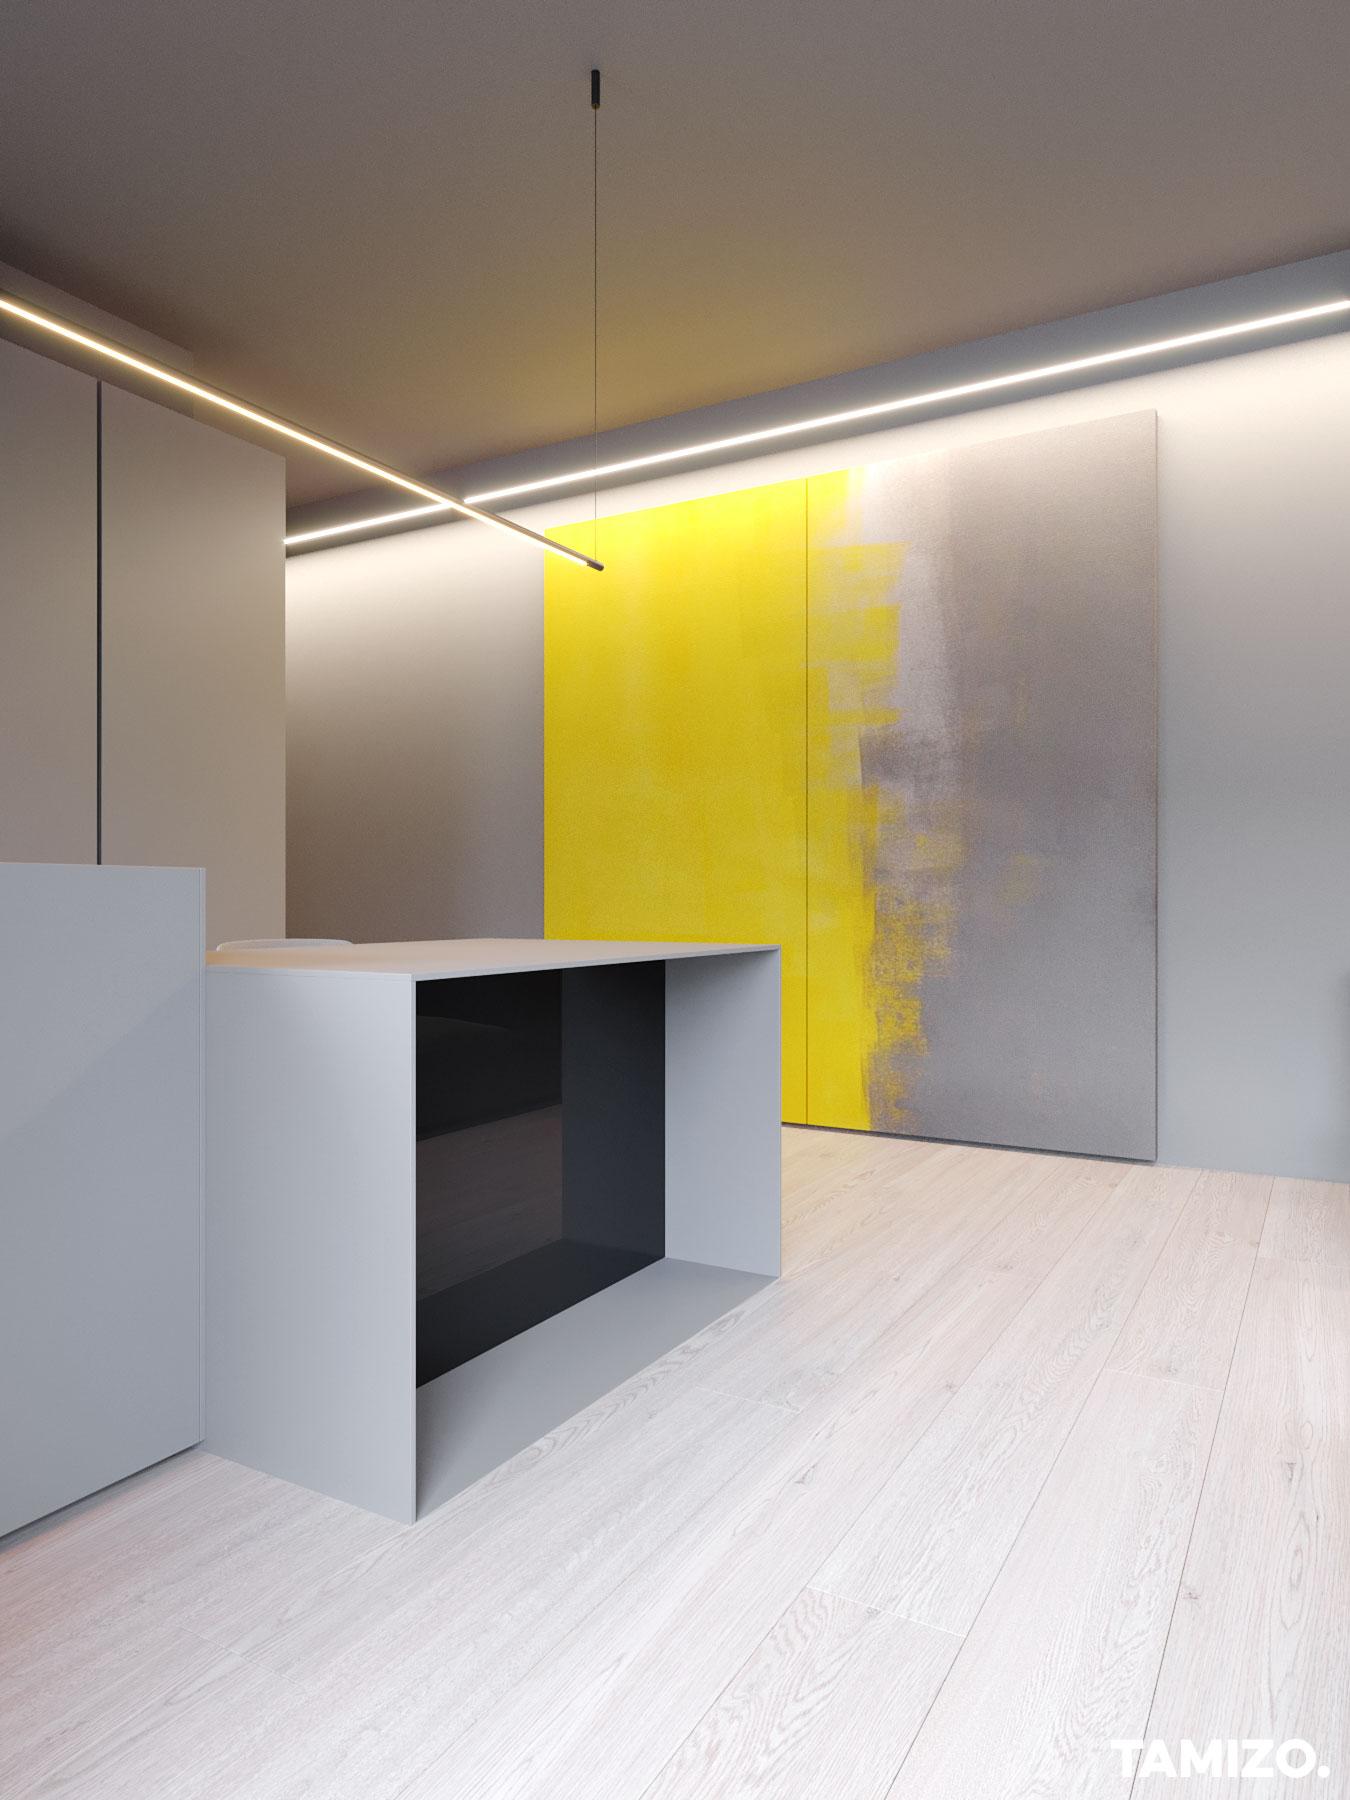 tamizo_interior_wnetrza_projekt_architekci_mateusz_kuo_stolarski_lodz_06